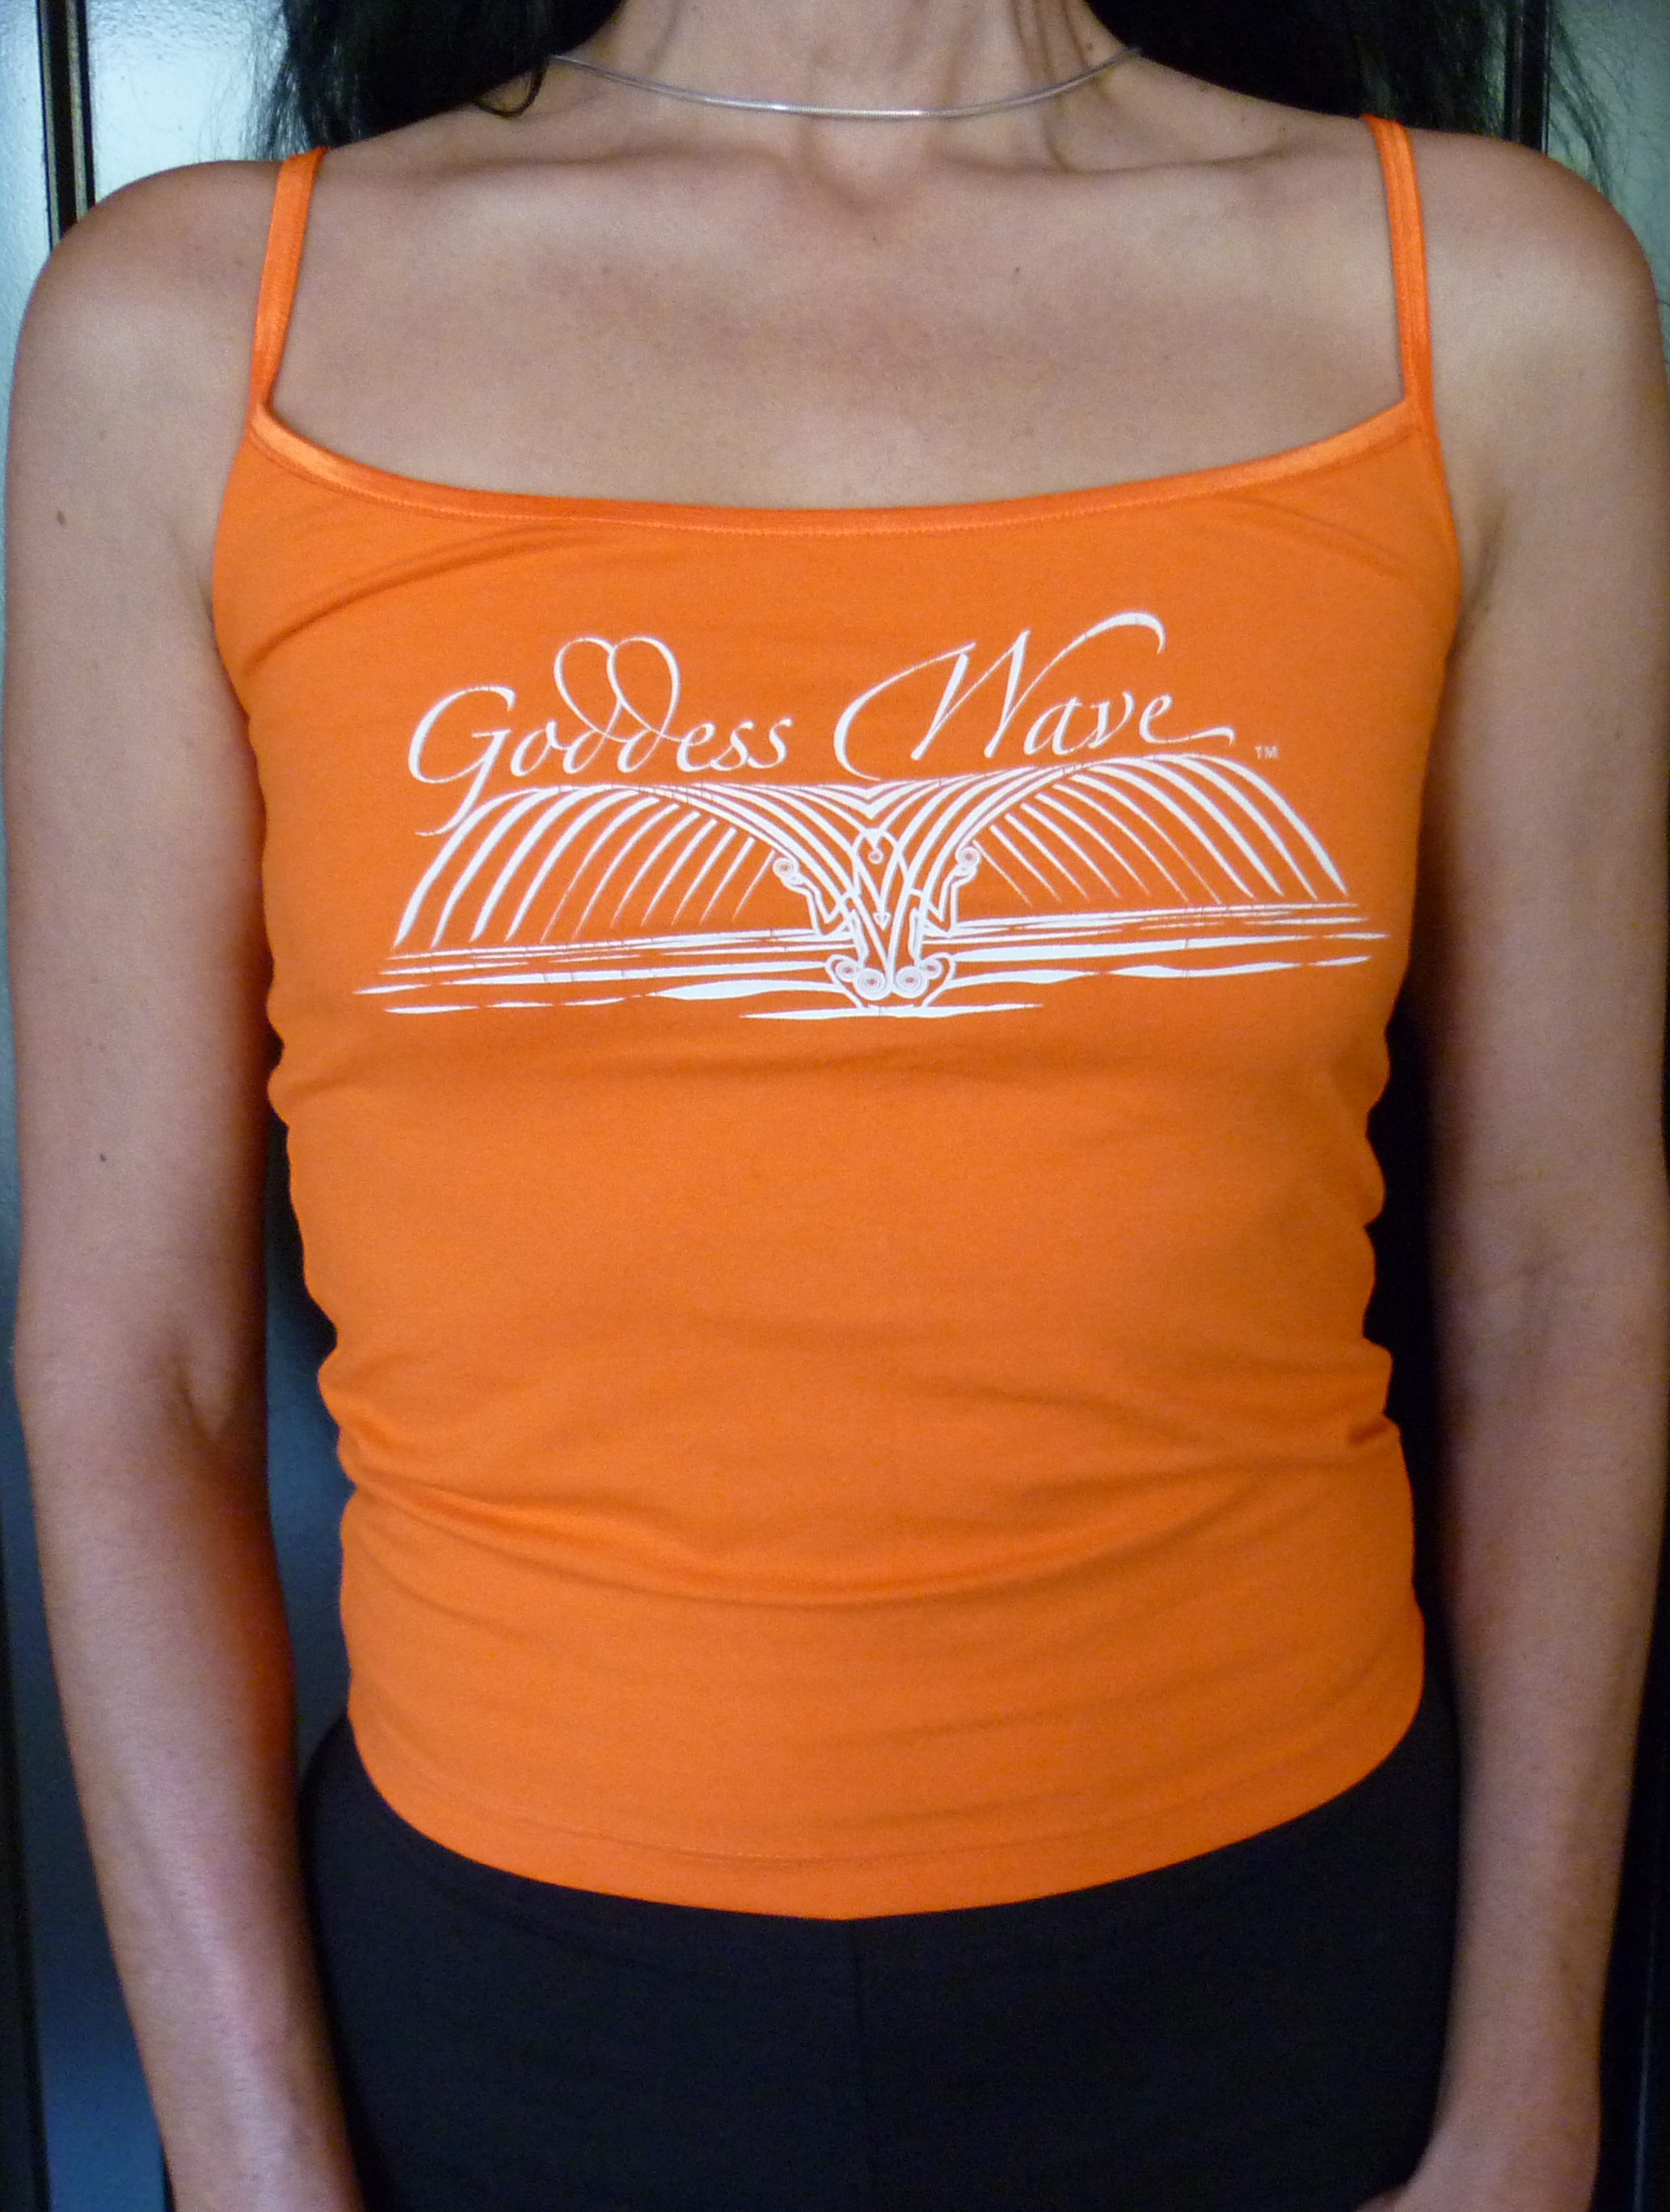 Goddess Wave tee shirts